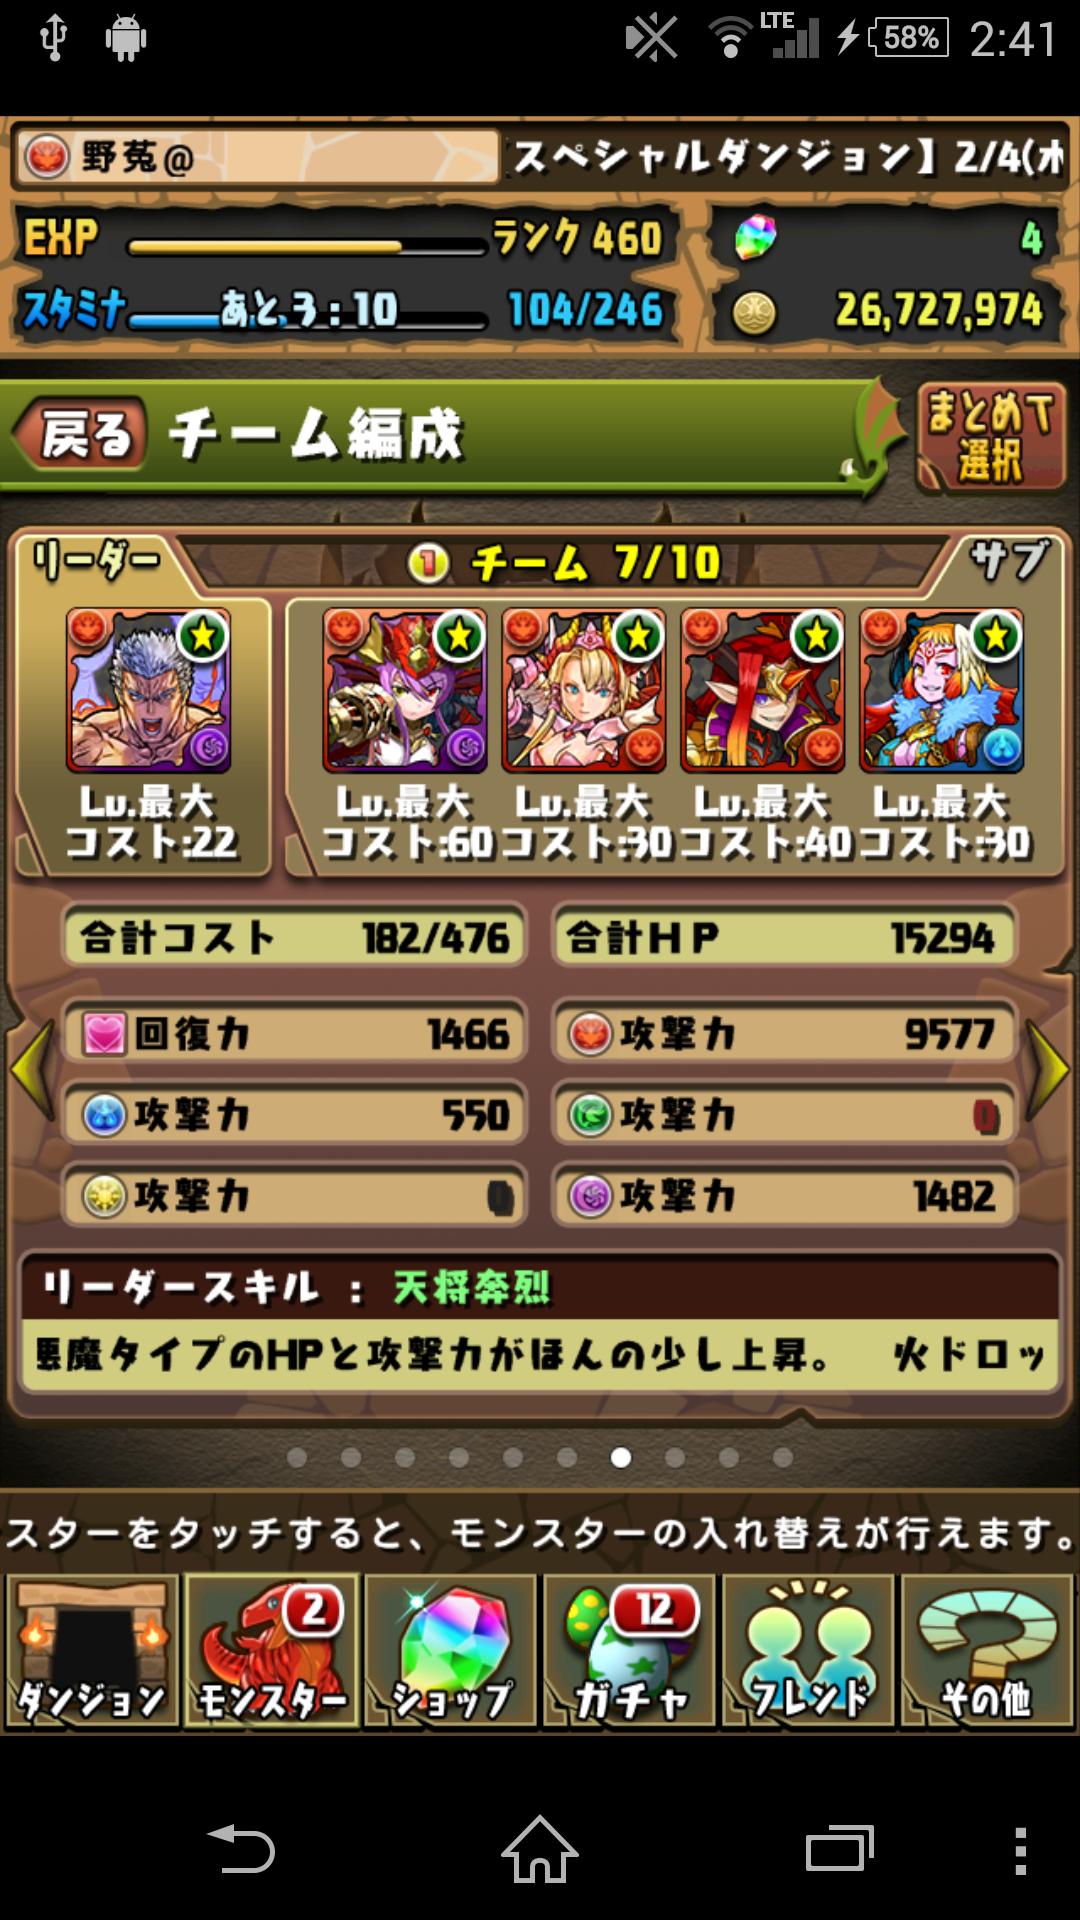 Screenshot_2015-02-08-02-41-42.png